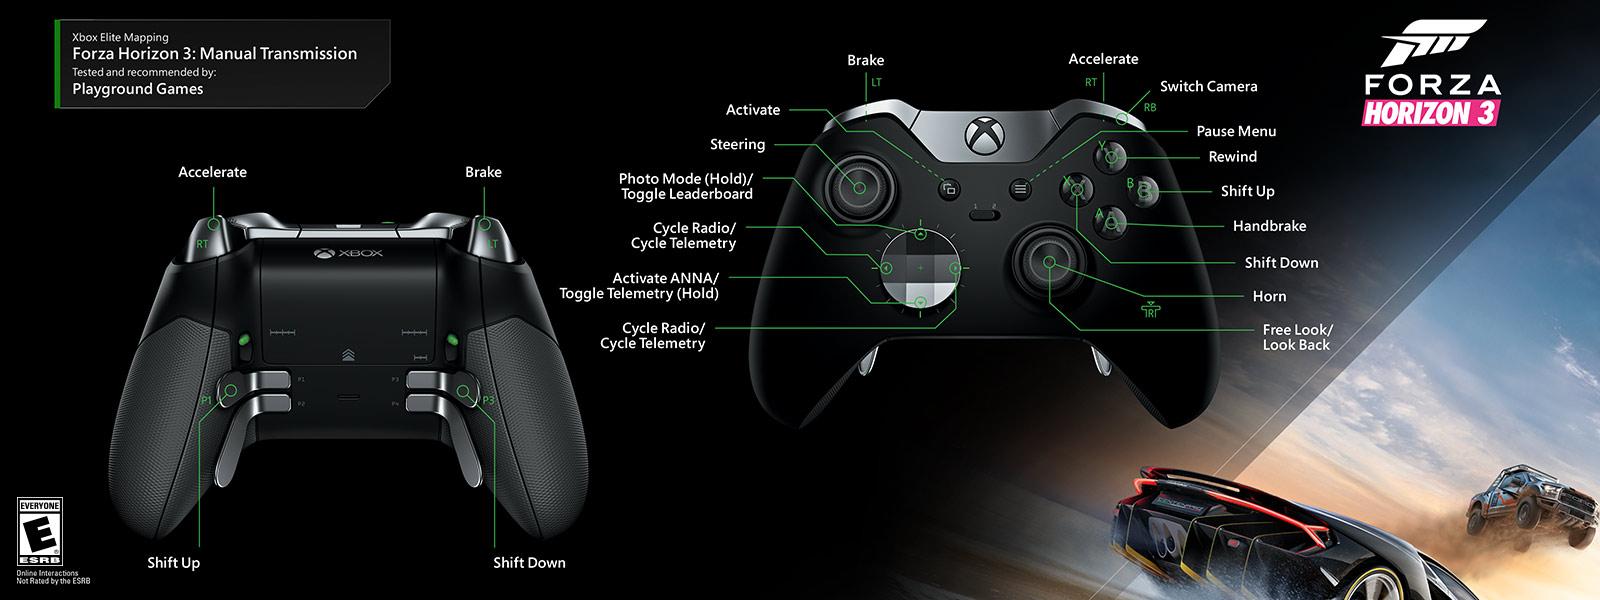 Forza Horizon 3 – Manual Transmission Elite Mapping